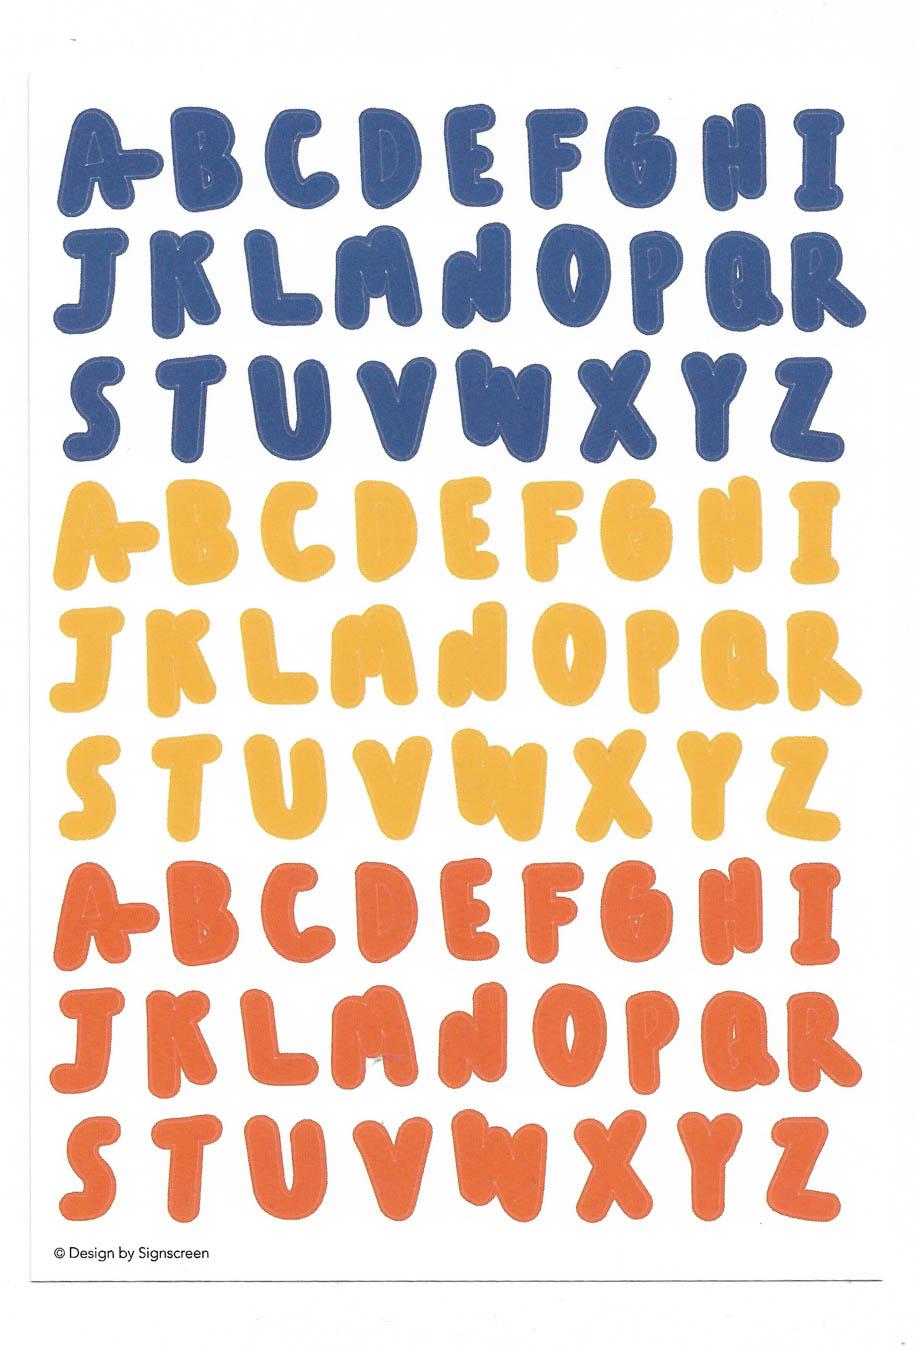 A-Z Sticker (Blue Yellow Orange)